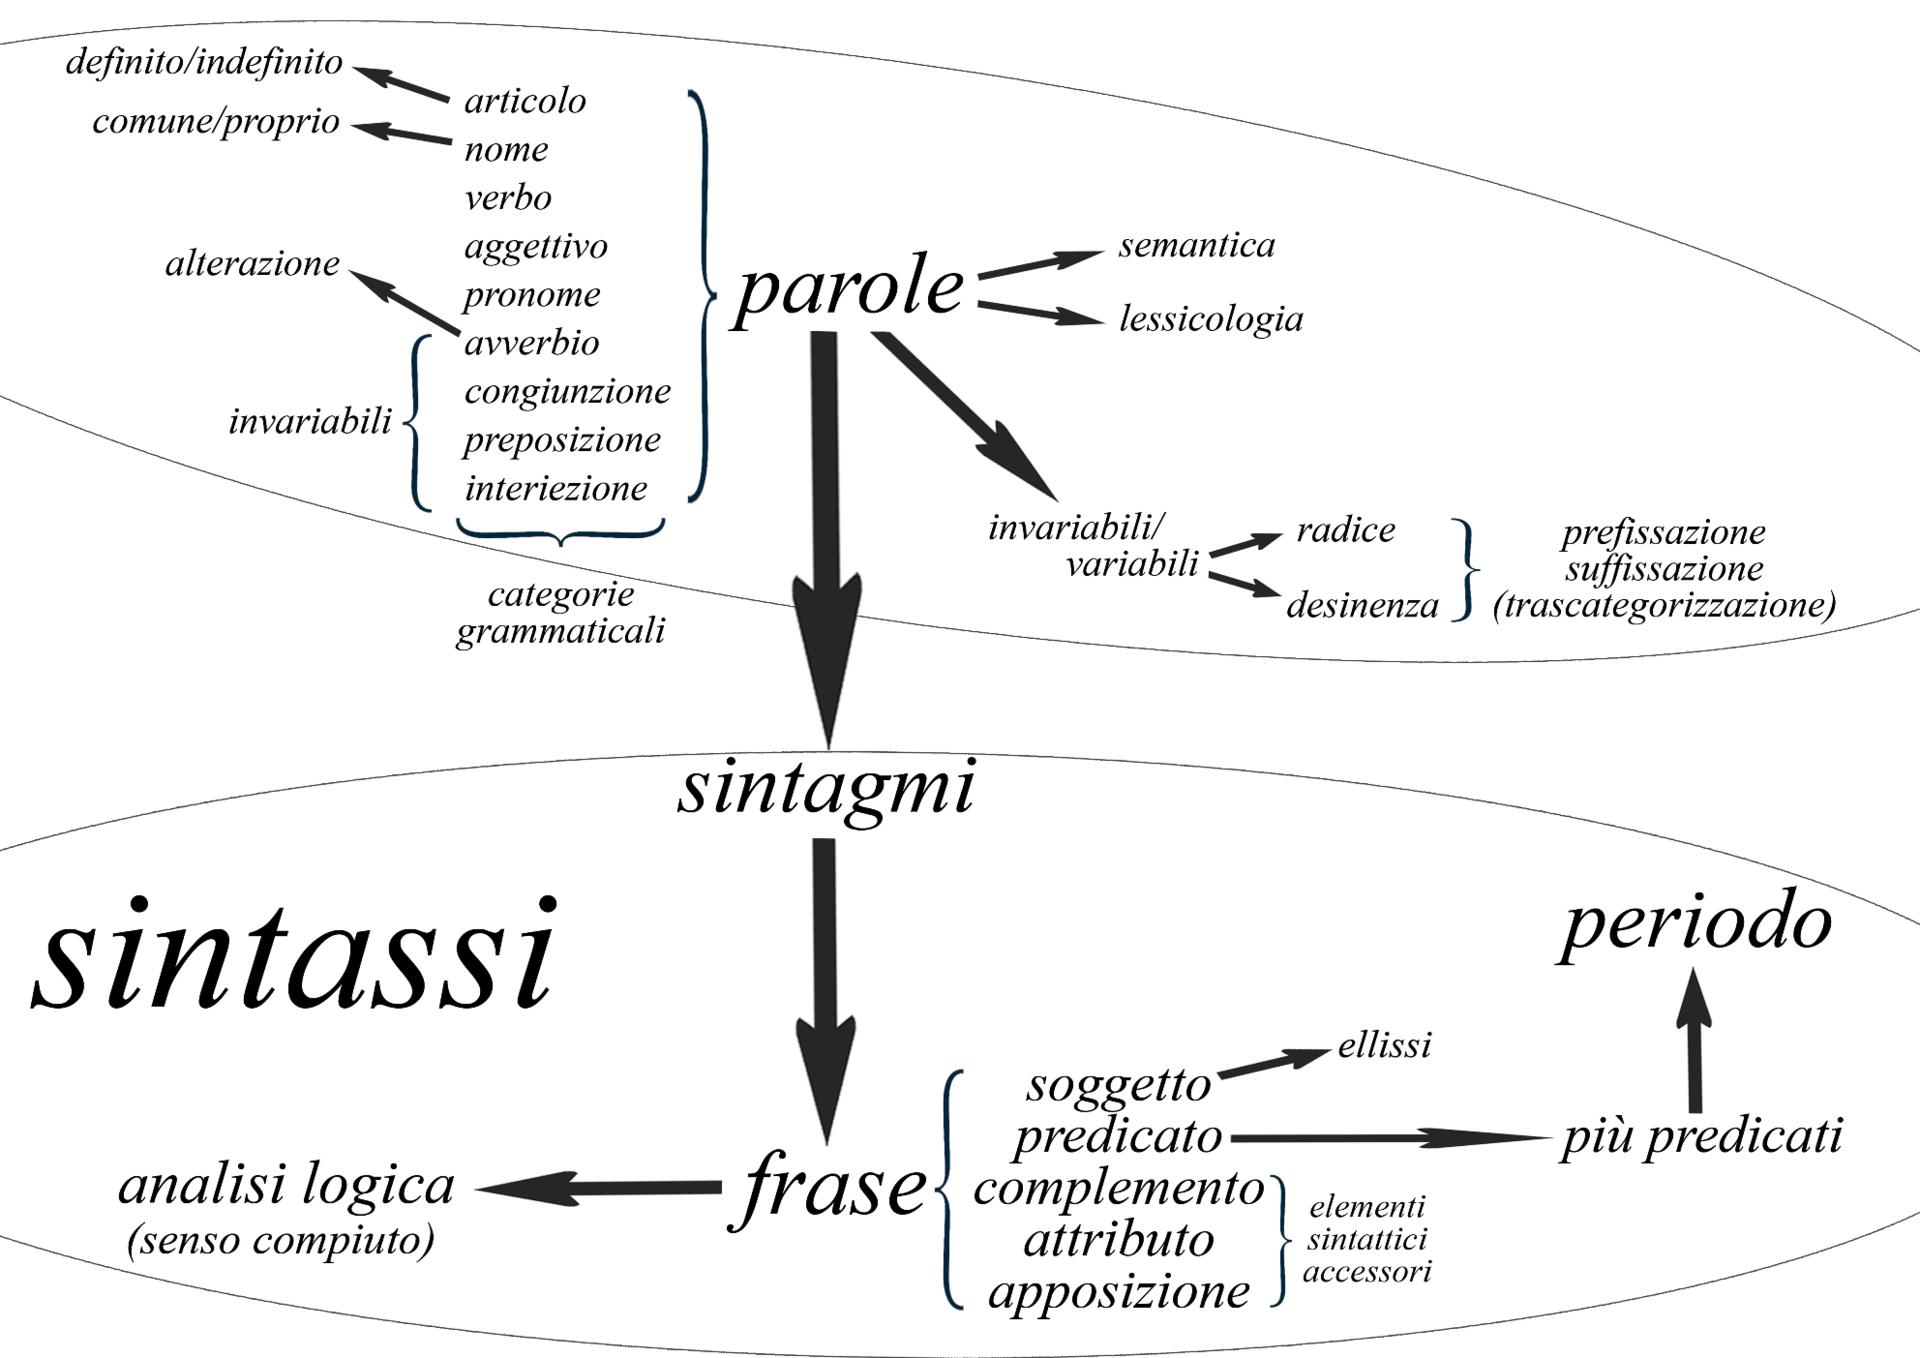 Grammatica italiana wikipedia for Analisi grammaticale di diversi